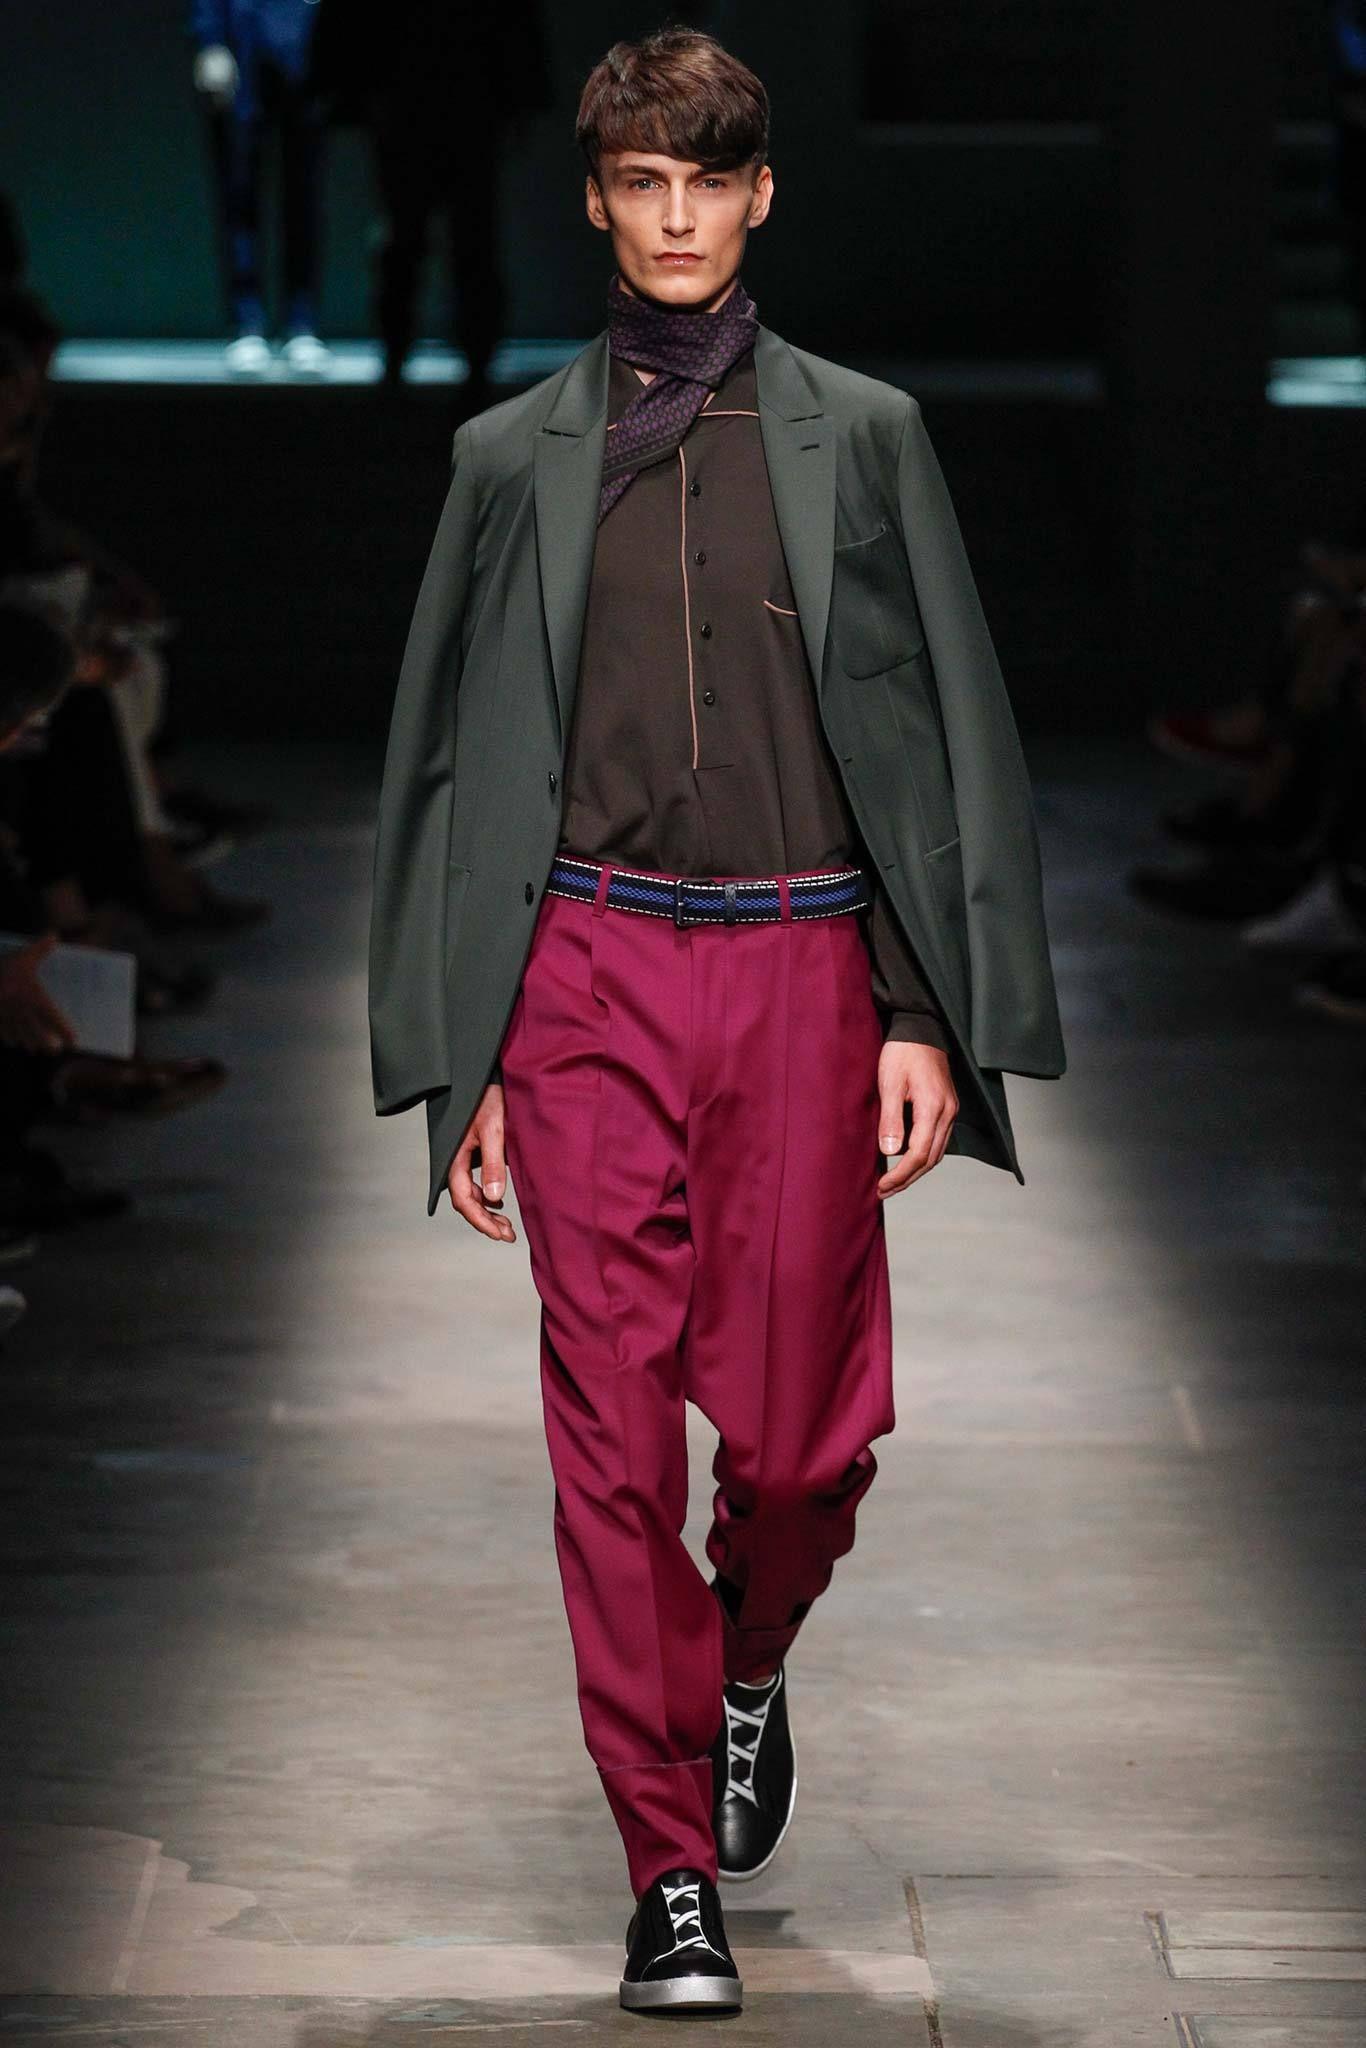 5a51116c33a55b Spring 2015 Menswear - Ermenegildo Zegna Voorjaar 2015 Mode